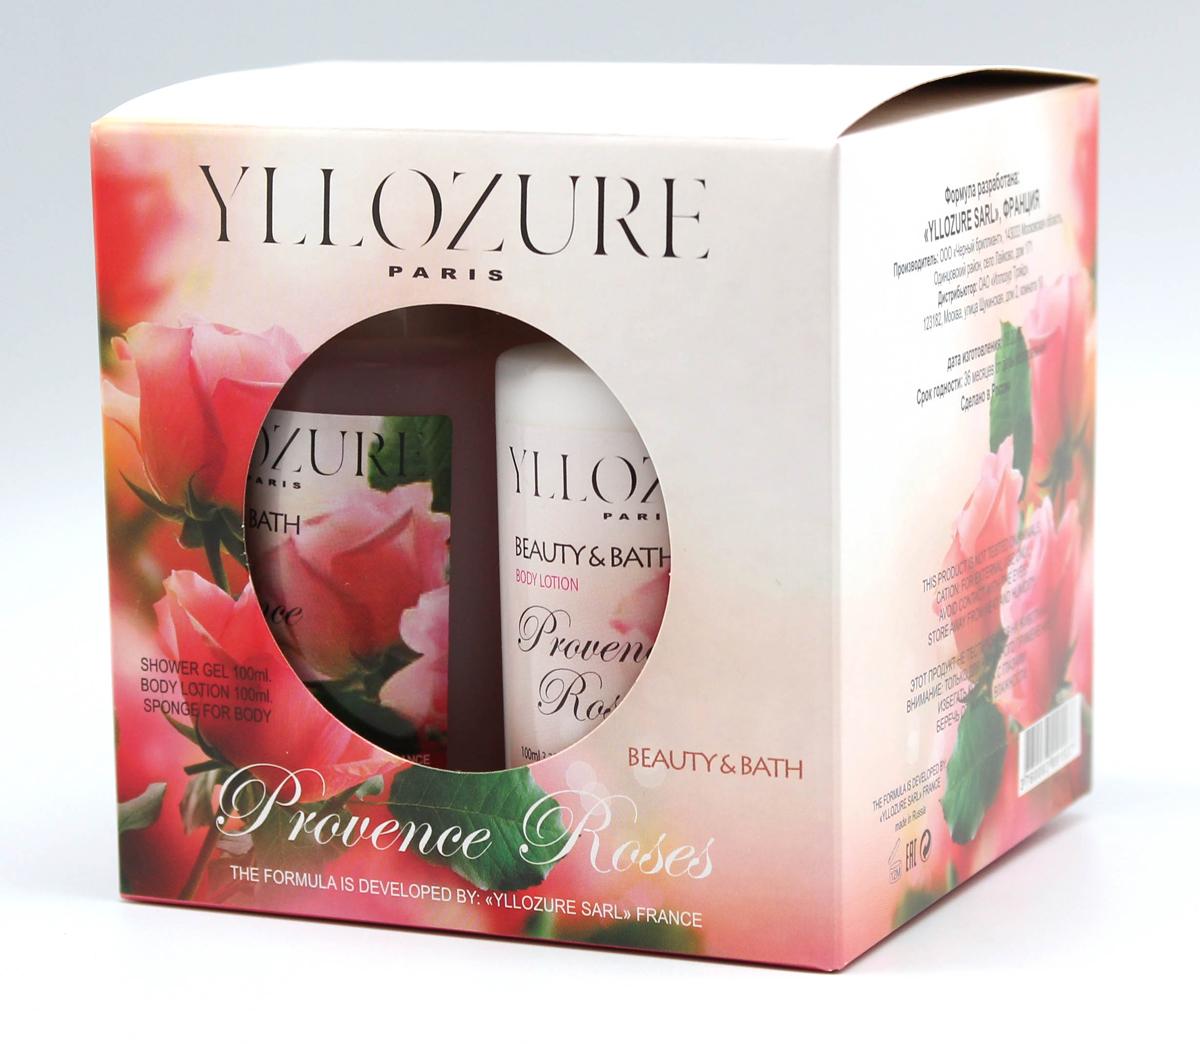 Yllozure Набор для тела Роза: гель для душа, 100 мл + лосьон для тела 100, мл + спонж